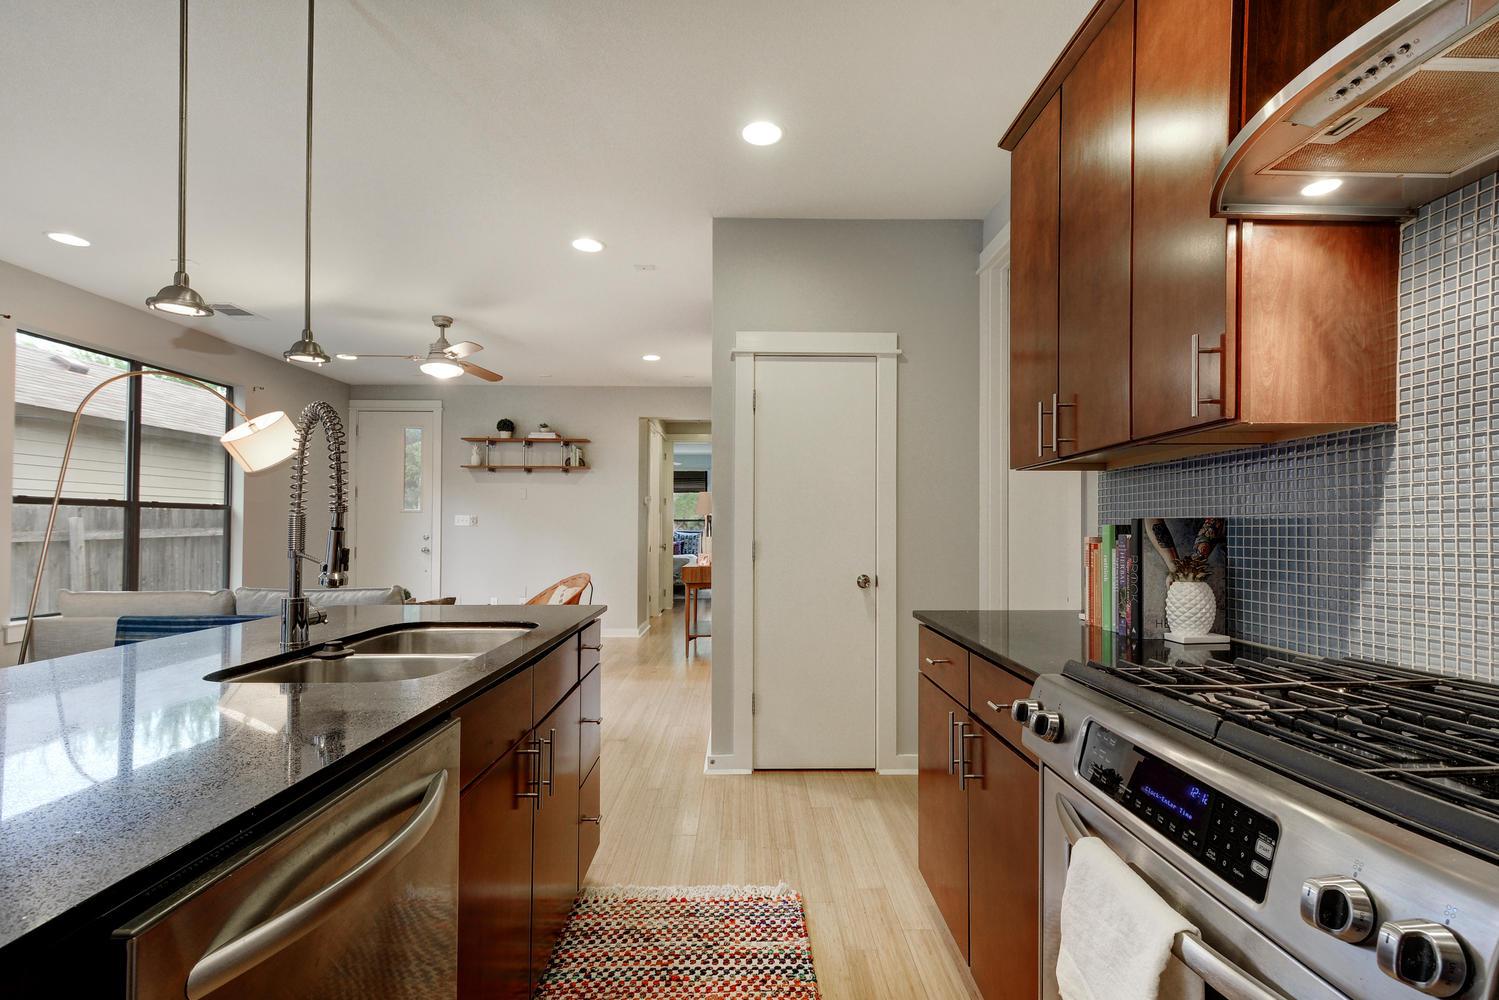 2909 Corbin Ln-large-011-22-Kitchen 004-1500x1000-72dpi.jpg